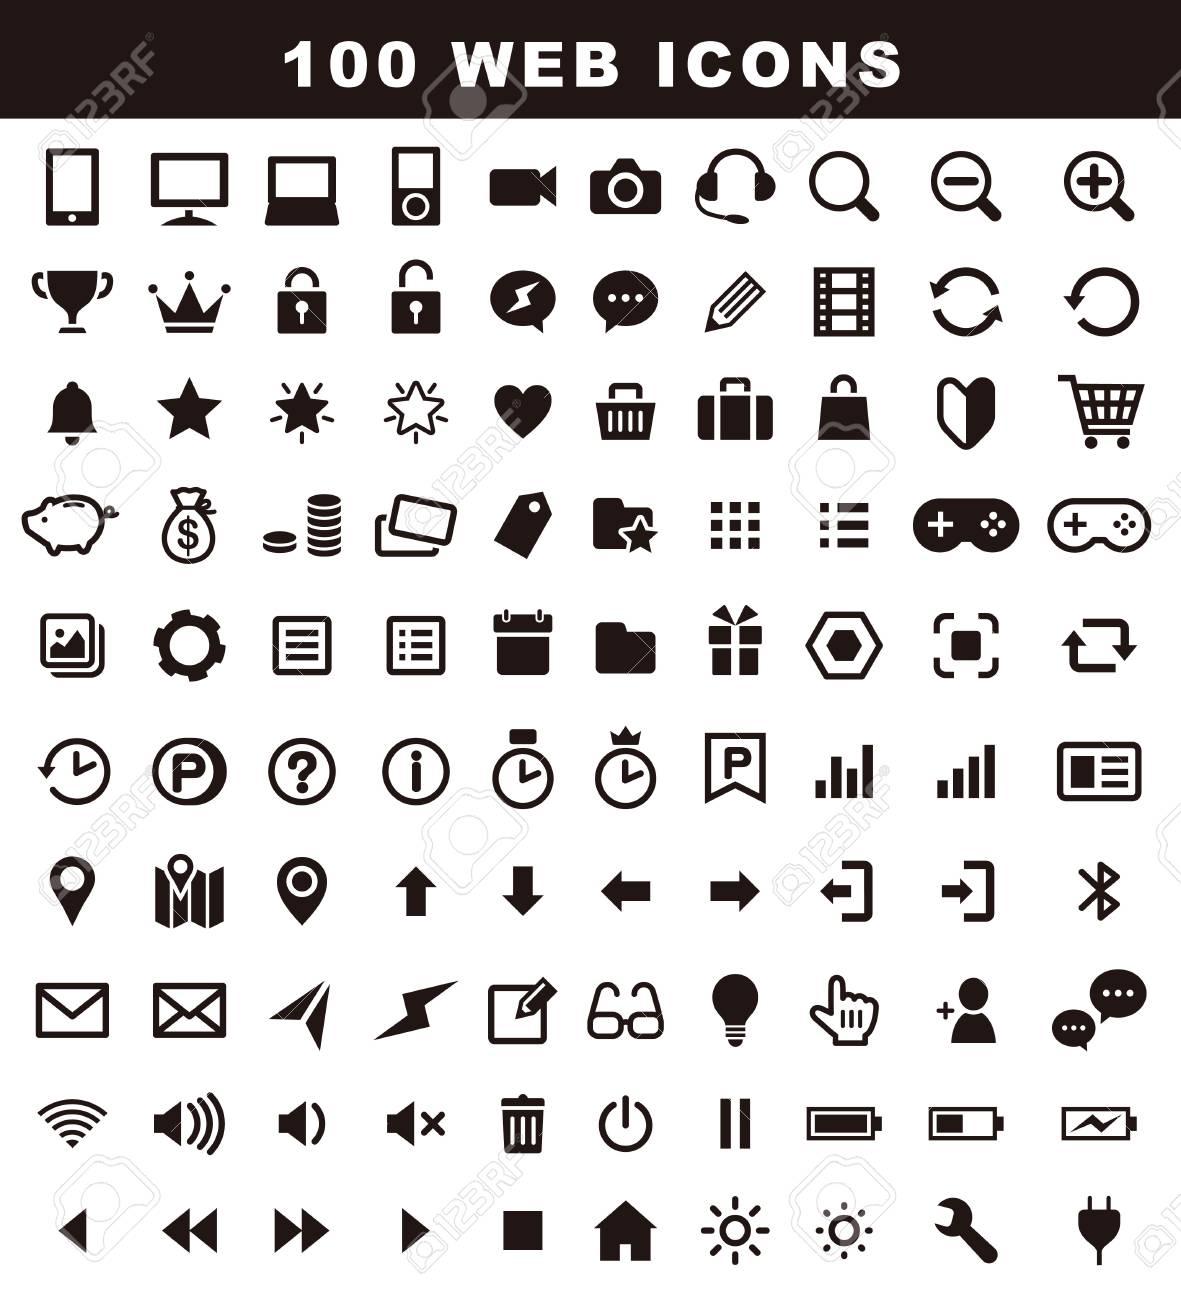 100 variety icons, web icon set - 121829121